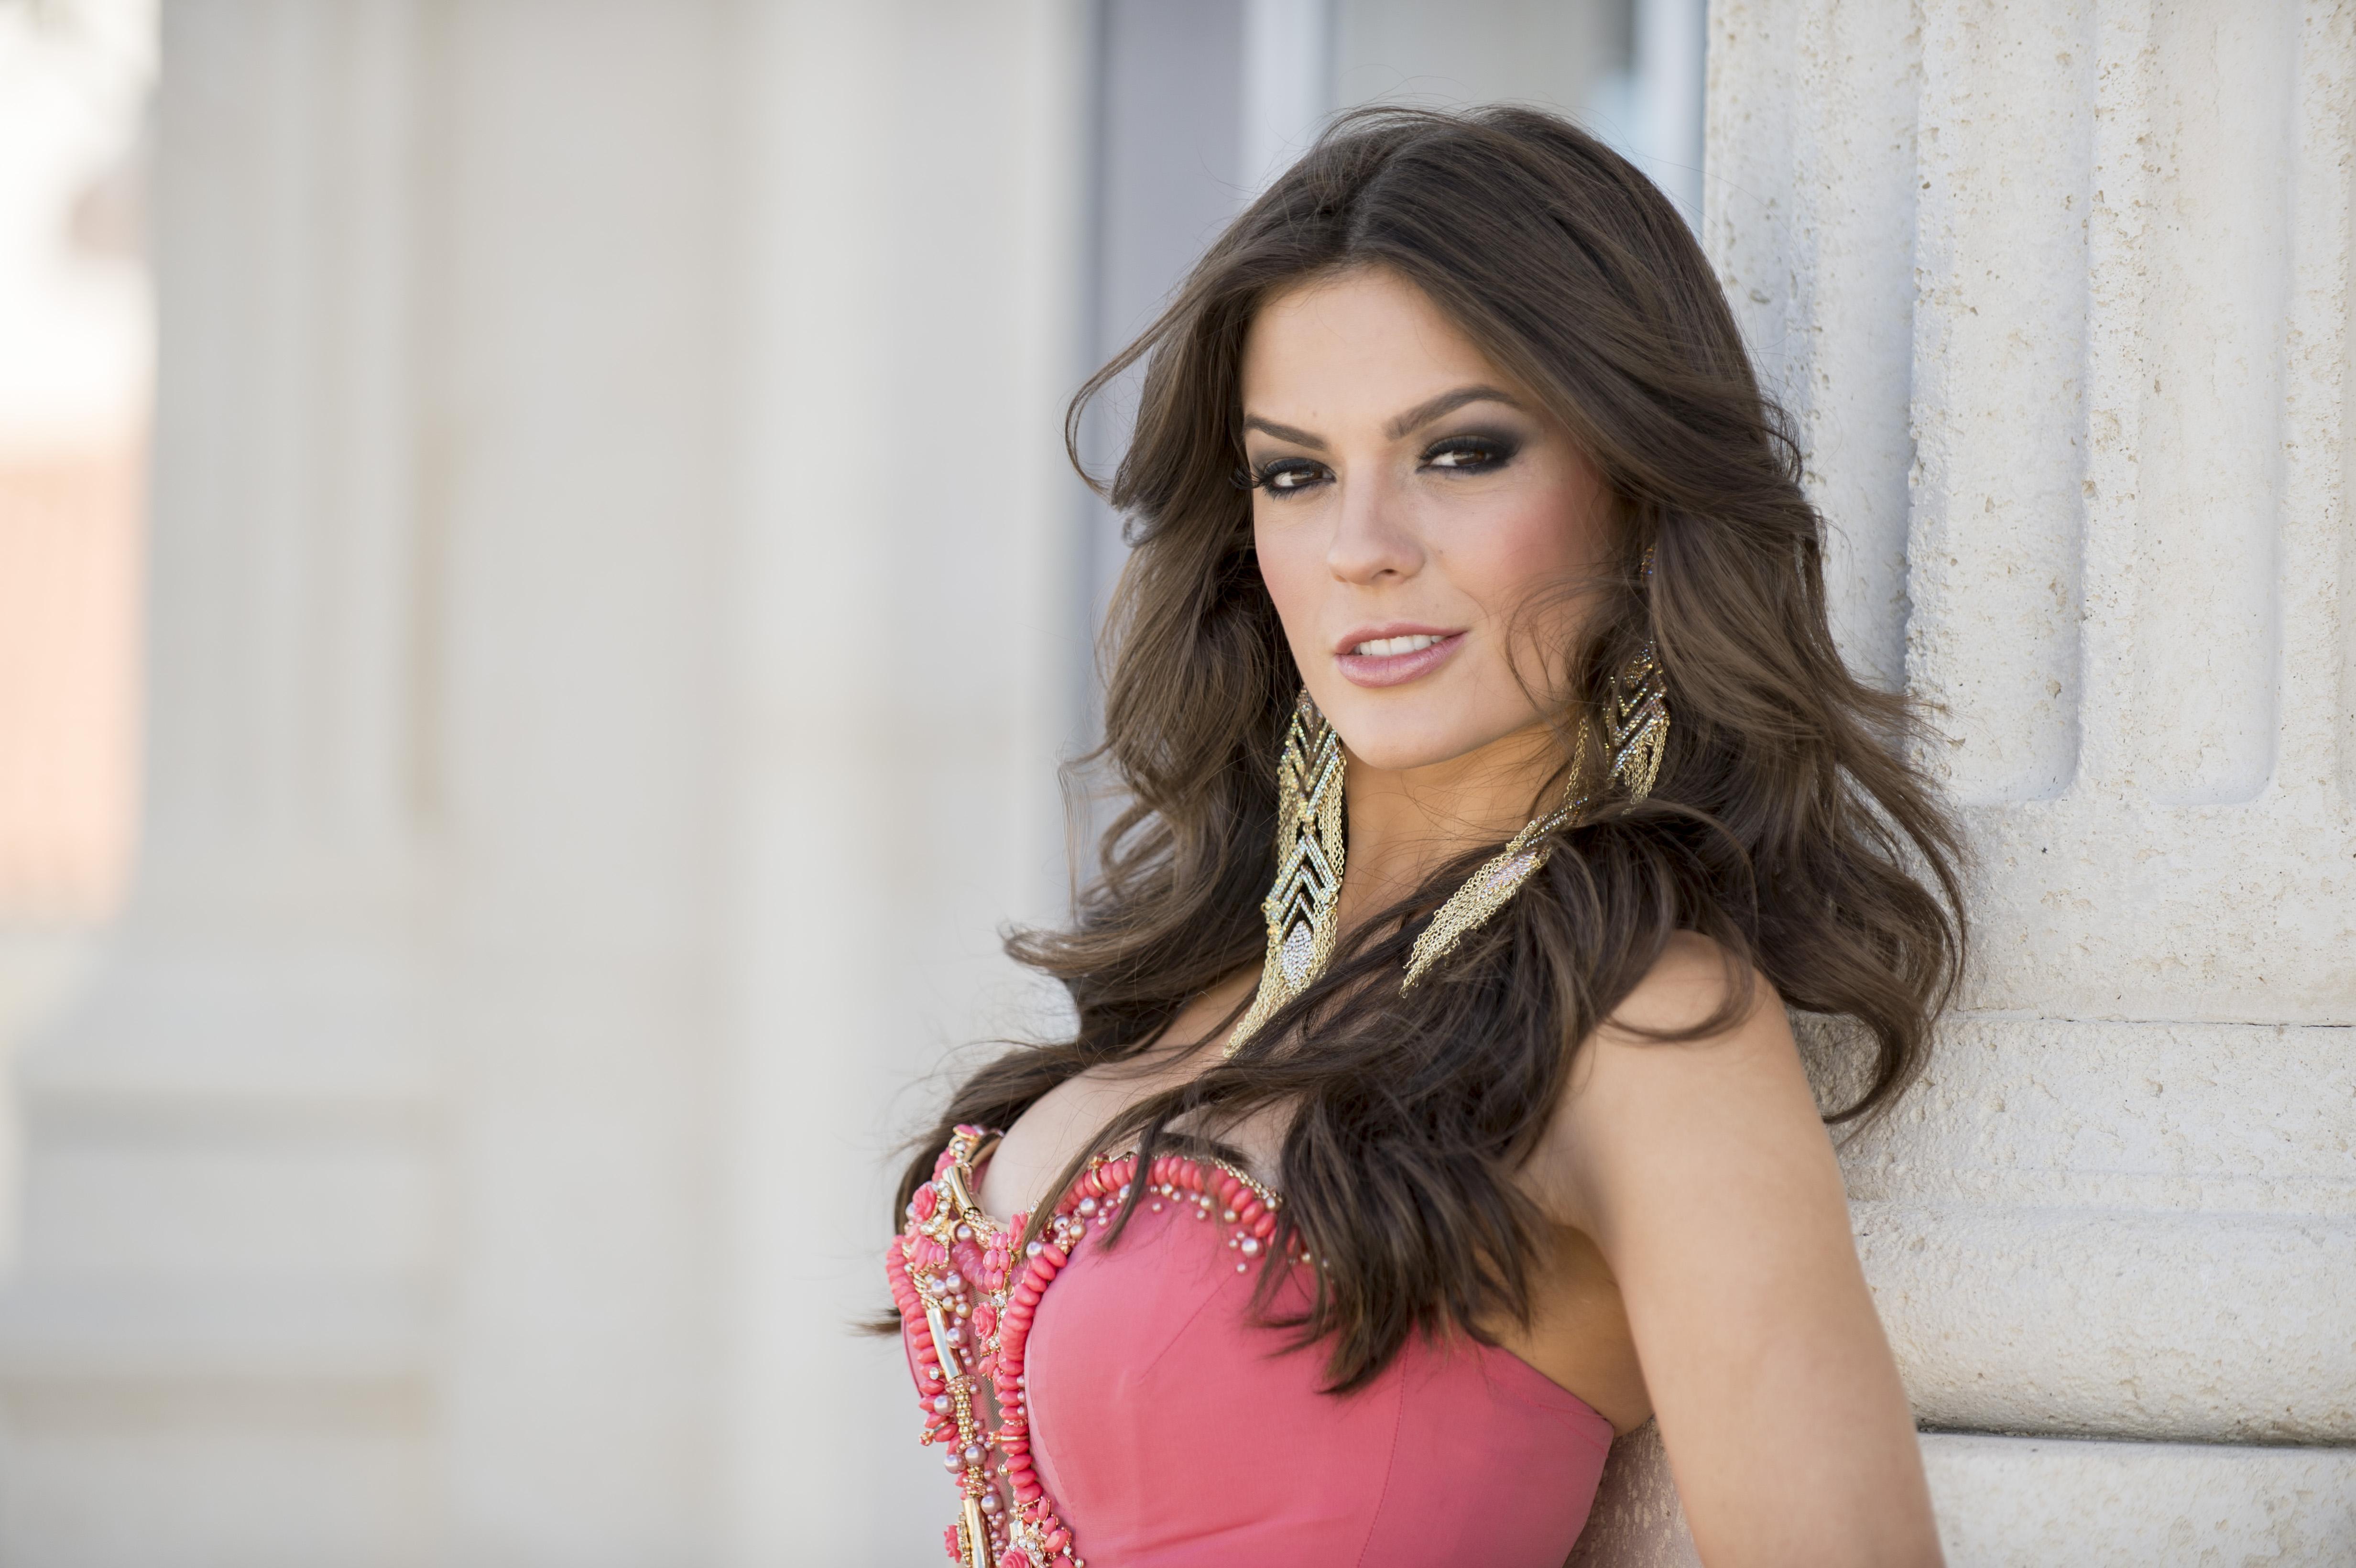 melissa gurgel, miss brasil 2014. - Página 2 Gown-Melissa-Gurgel-Miss-Universe-Brazil-2014_cdf8